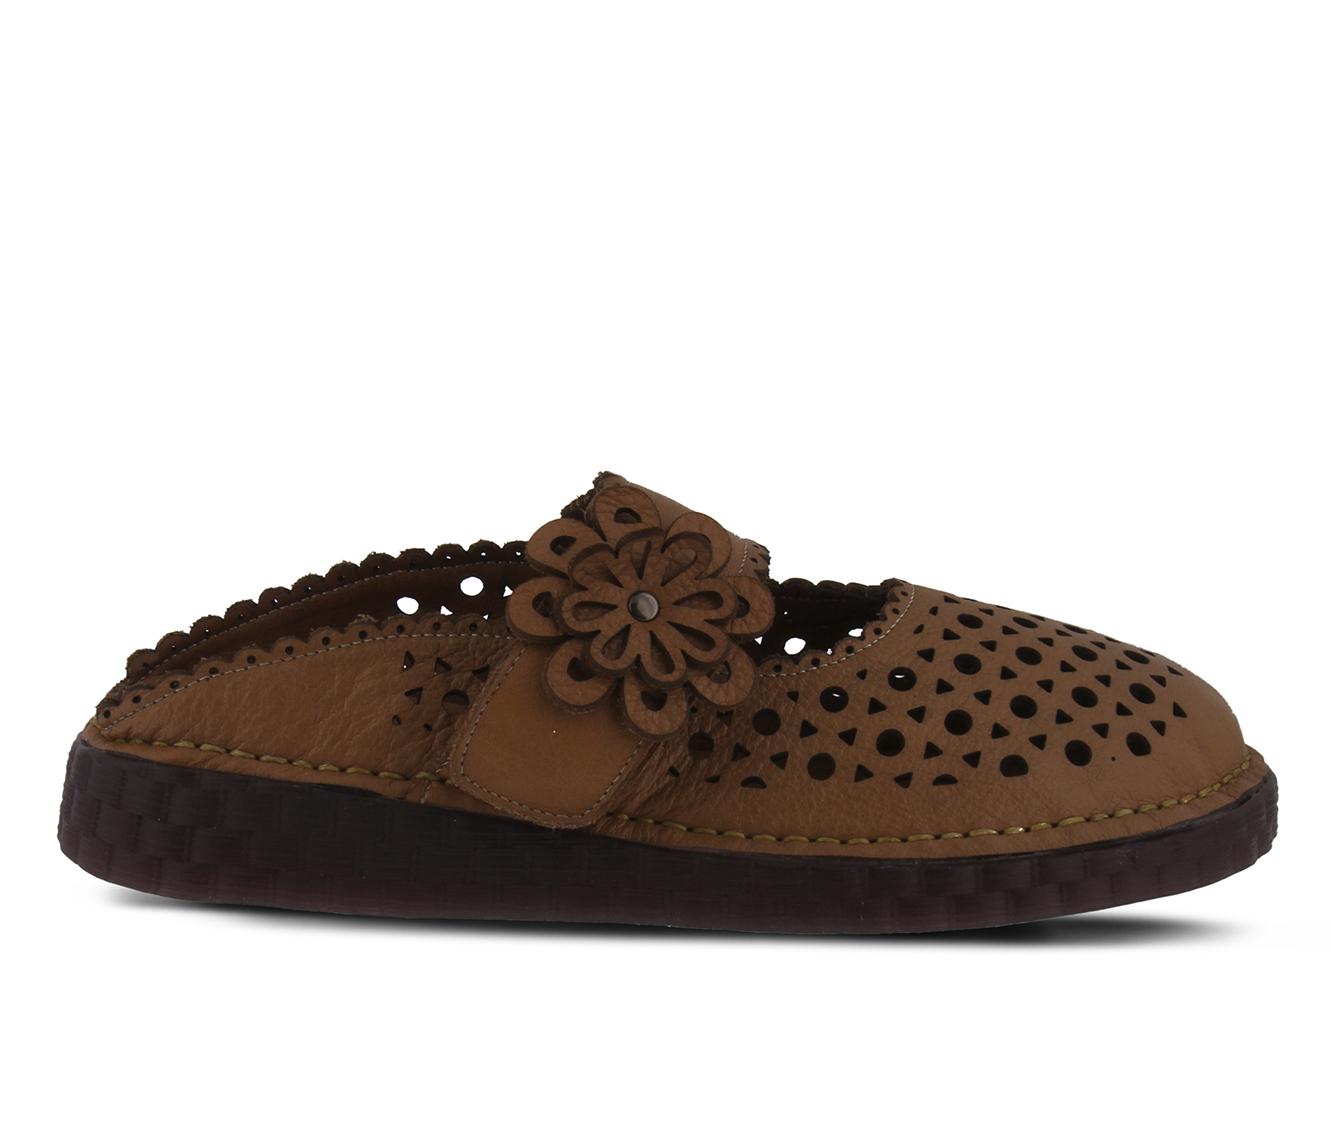 L'Artiste Smoosh Women's Shoe (Brown Leather)